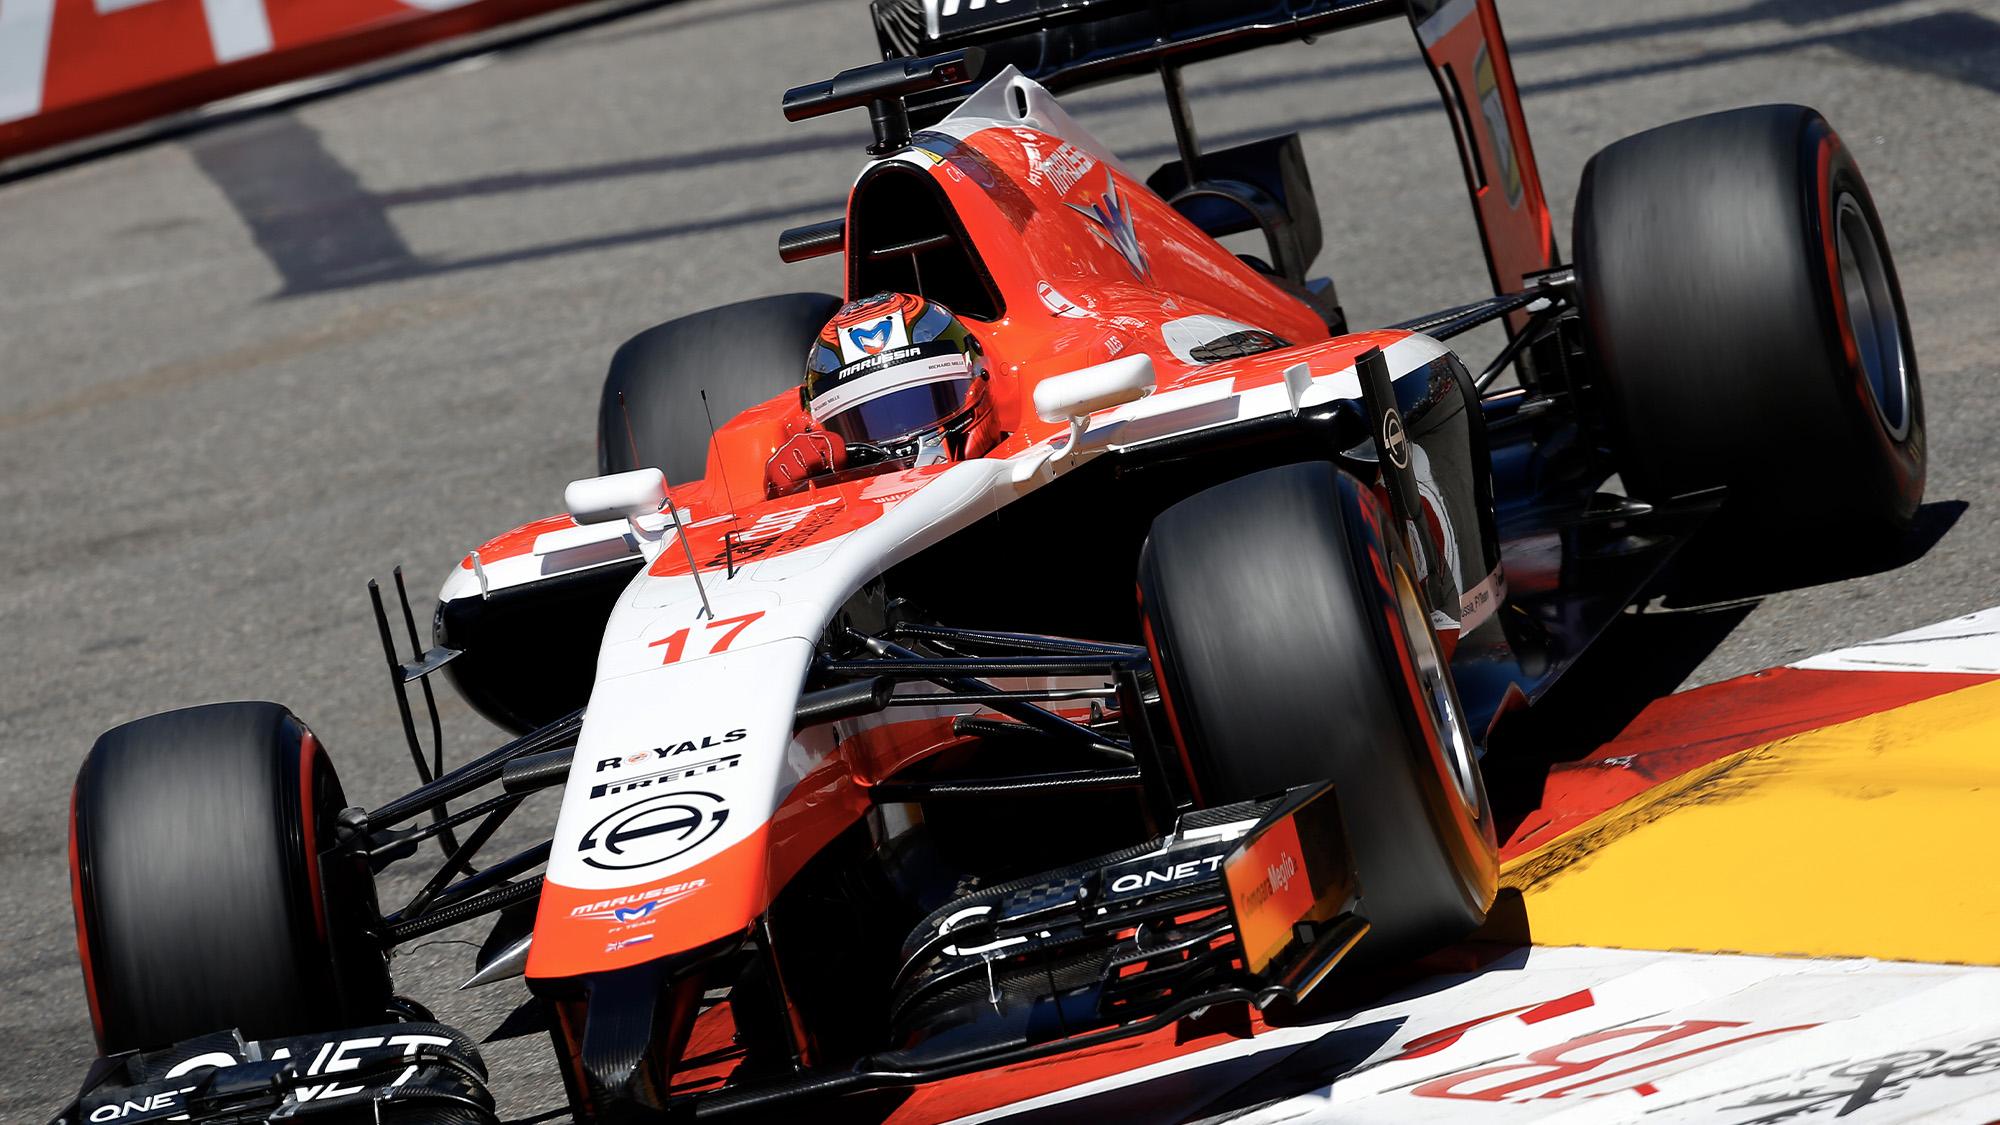 Jules Bianchi during the 2014 F1 Monaco Grand Prix